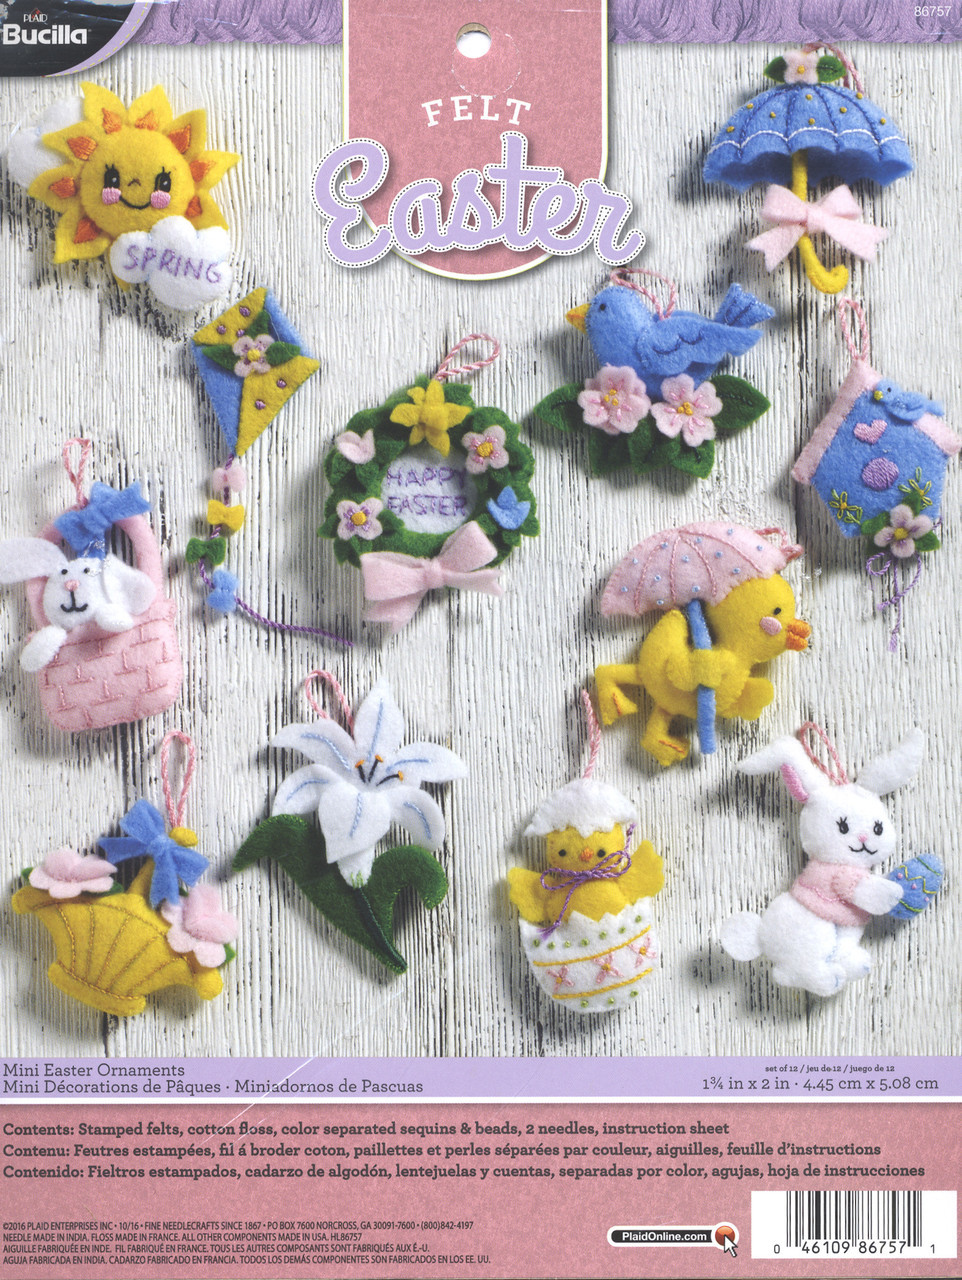 Plaid / Bucilla - Mini Easter Ornaments (set of 12)